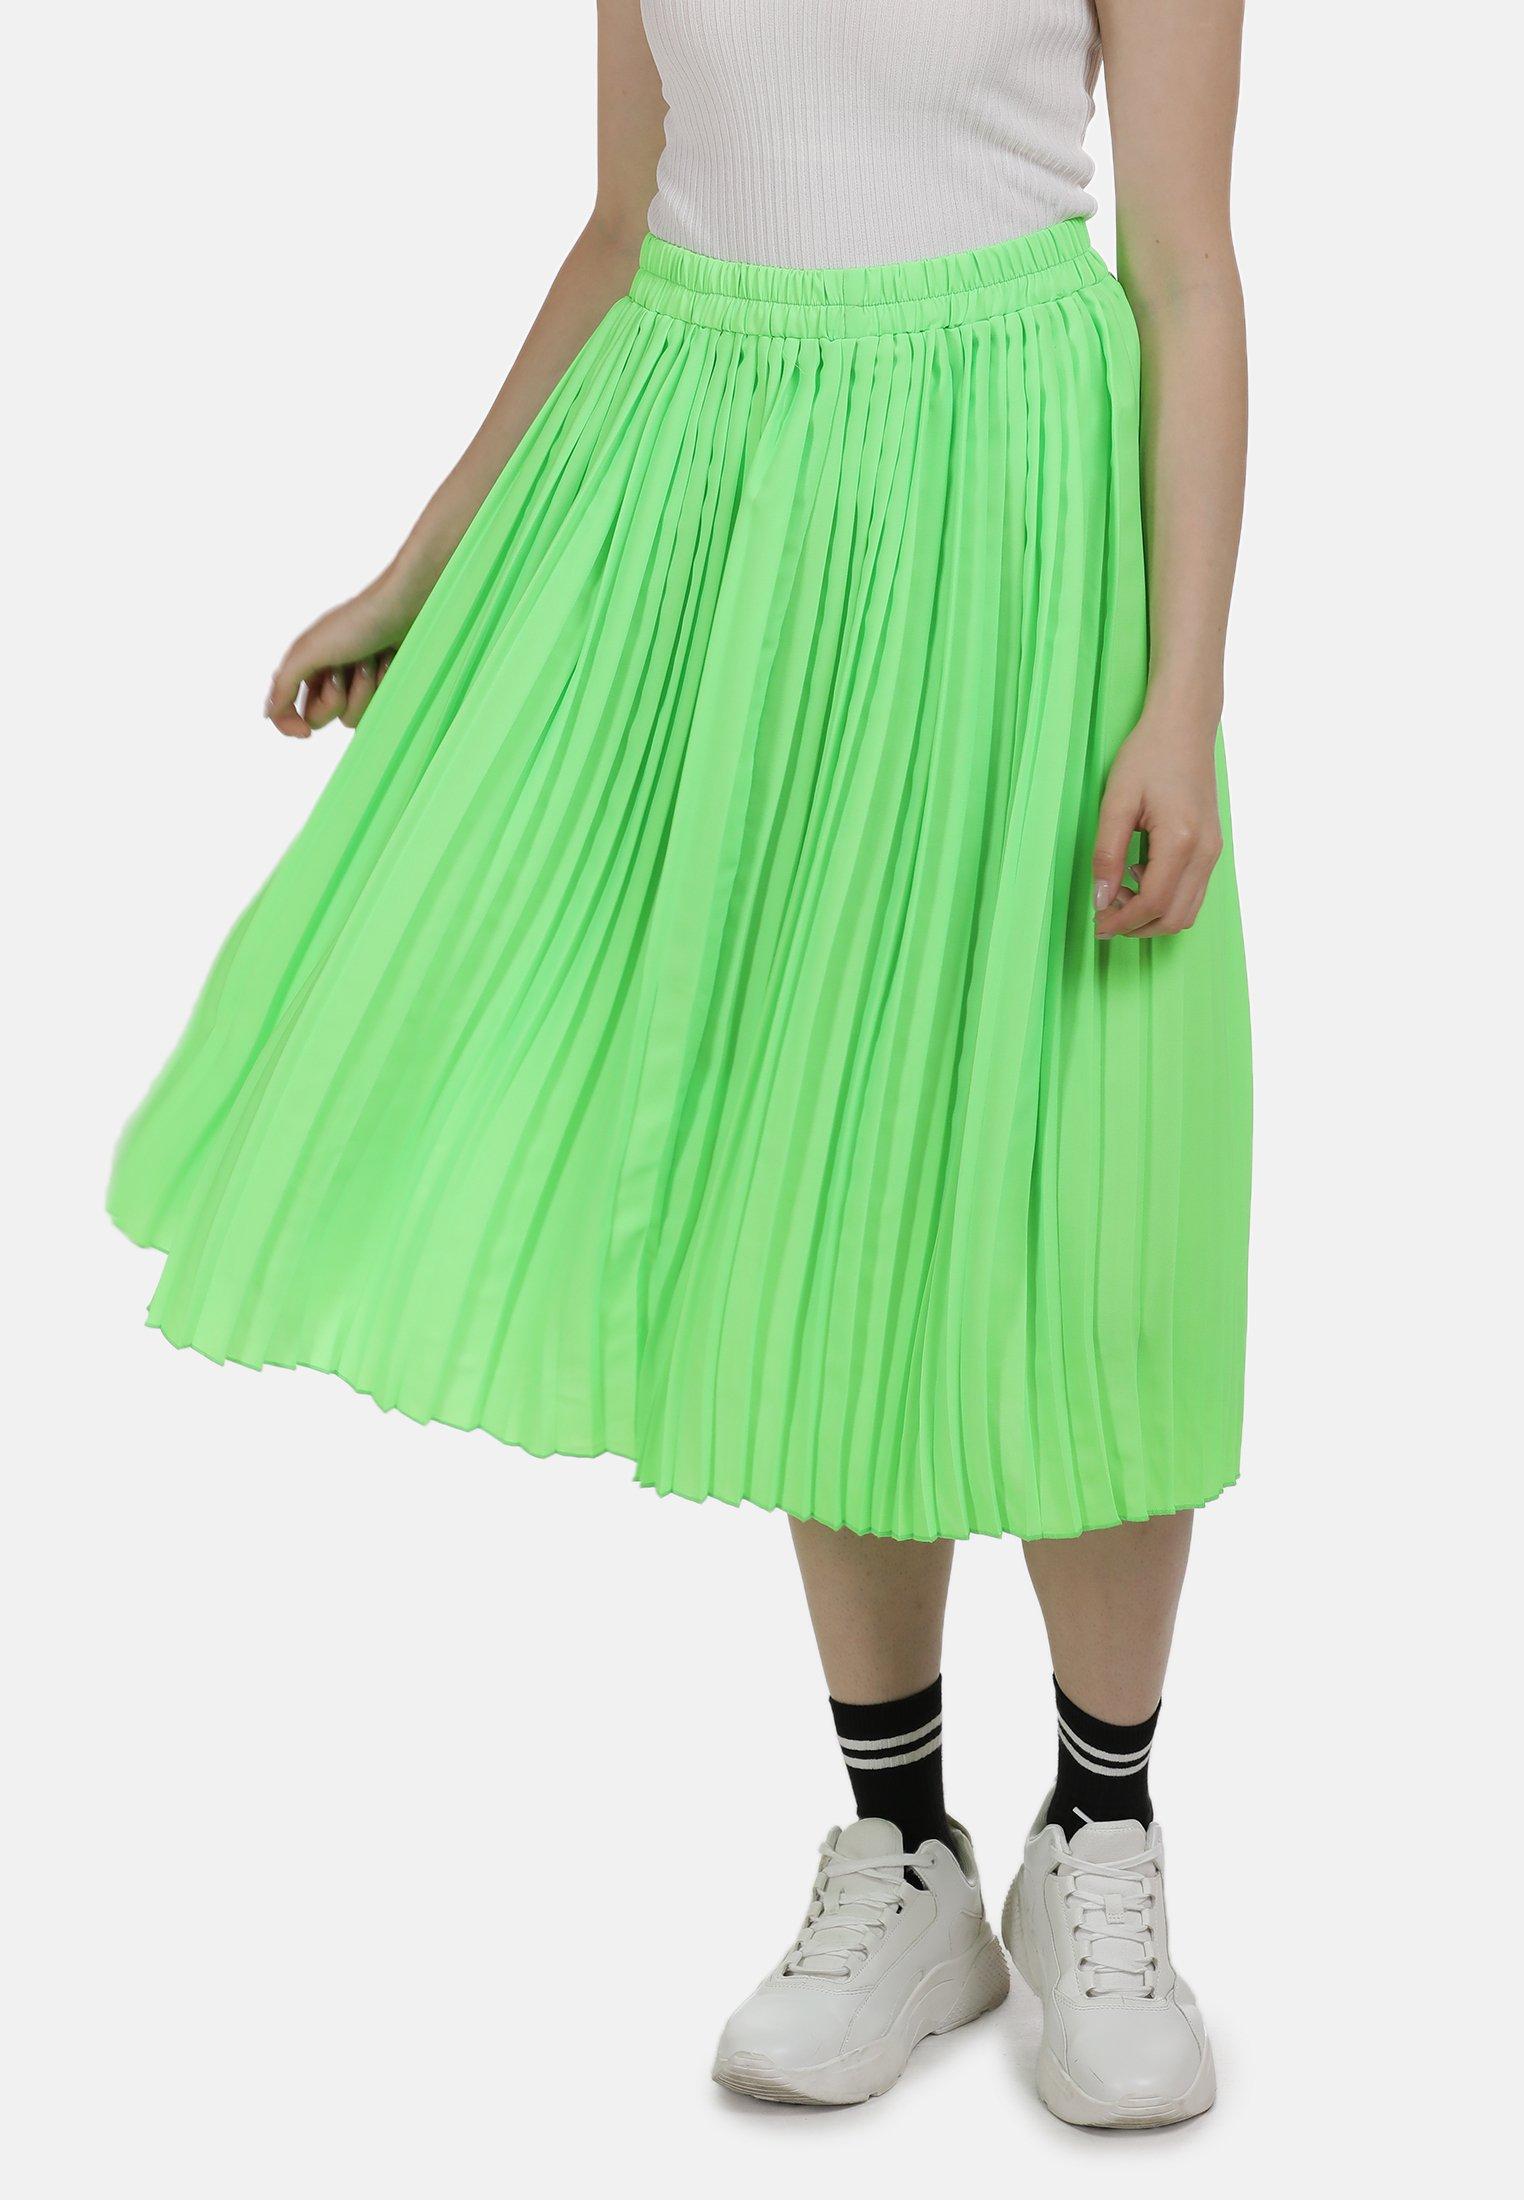 Get Women's Clothing myMo ROCK A-line skirt neon grün Ye2u9Mx2D